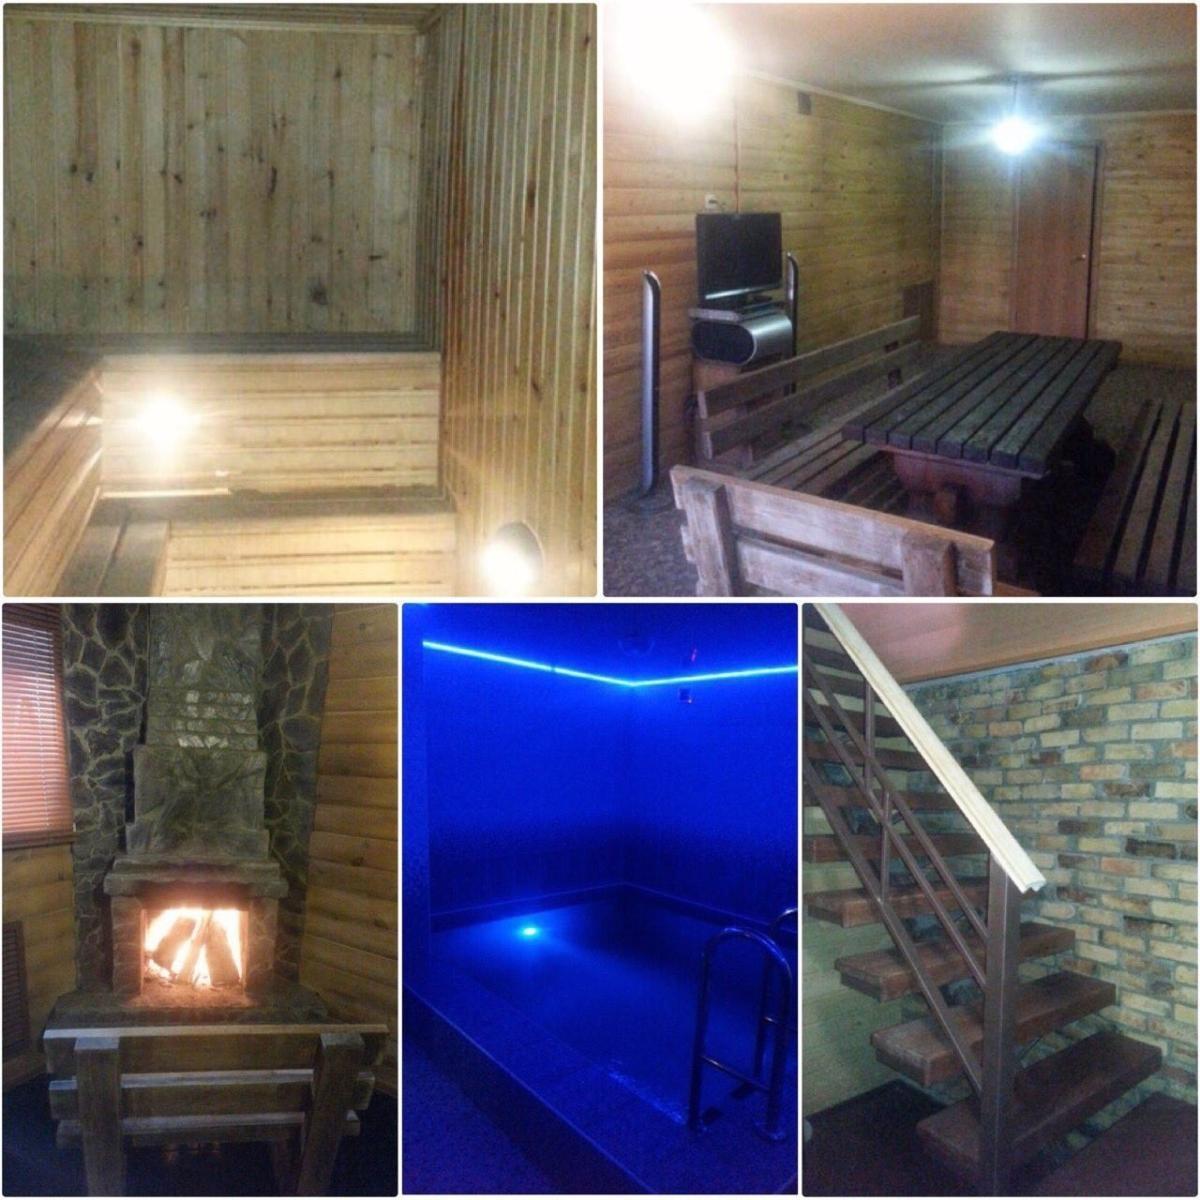 Алтайская Сказка, баня на дровах - №20